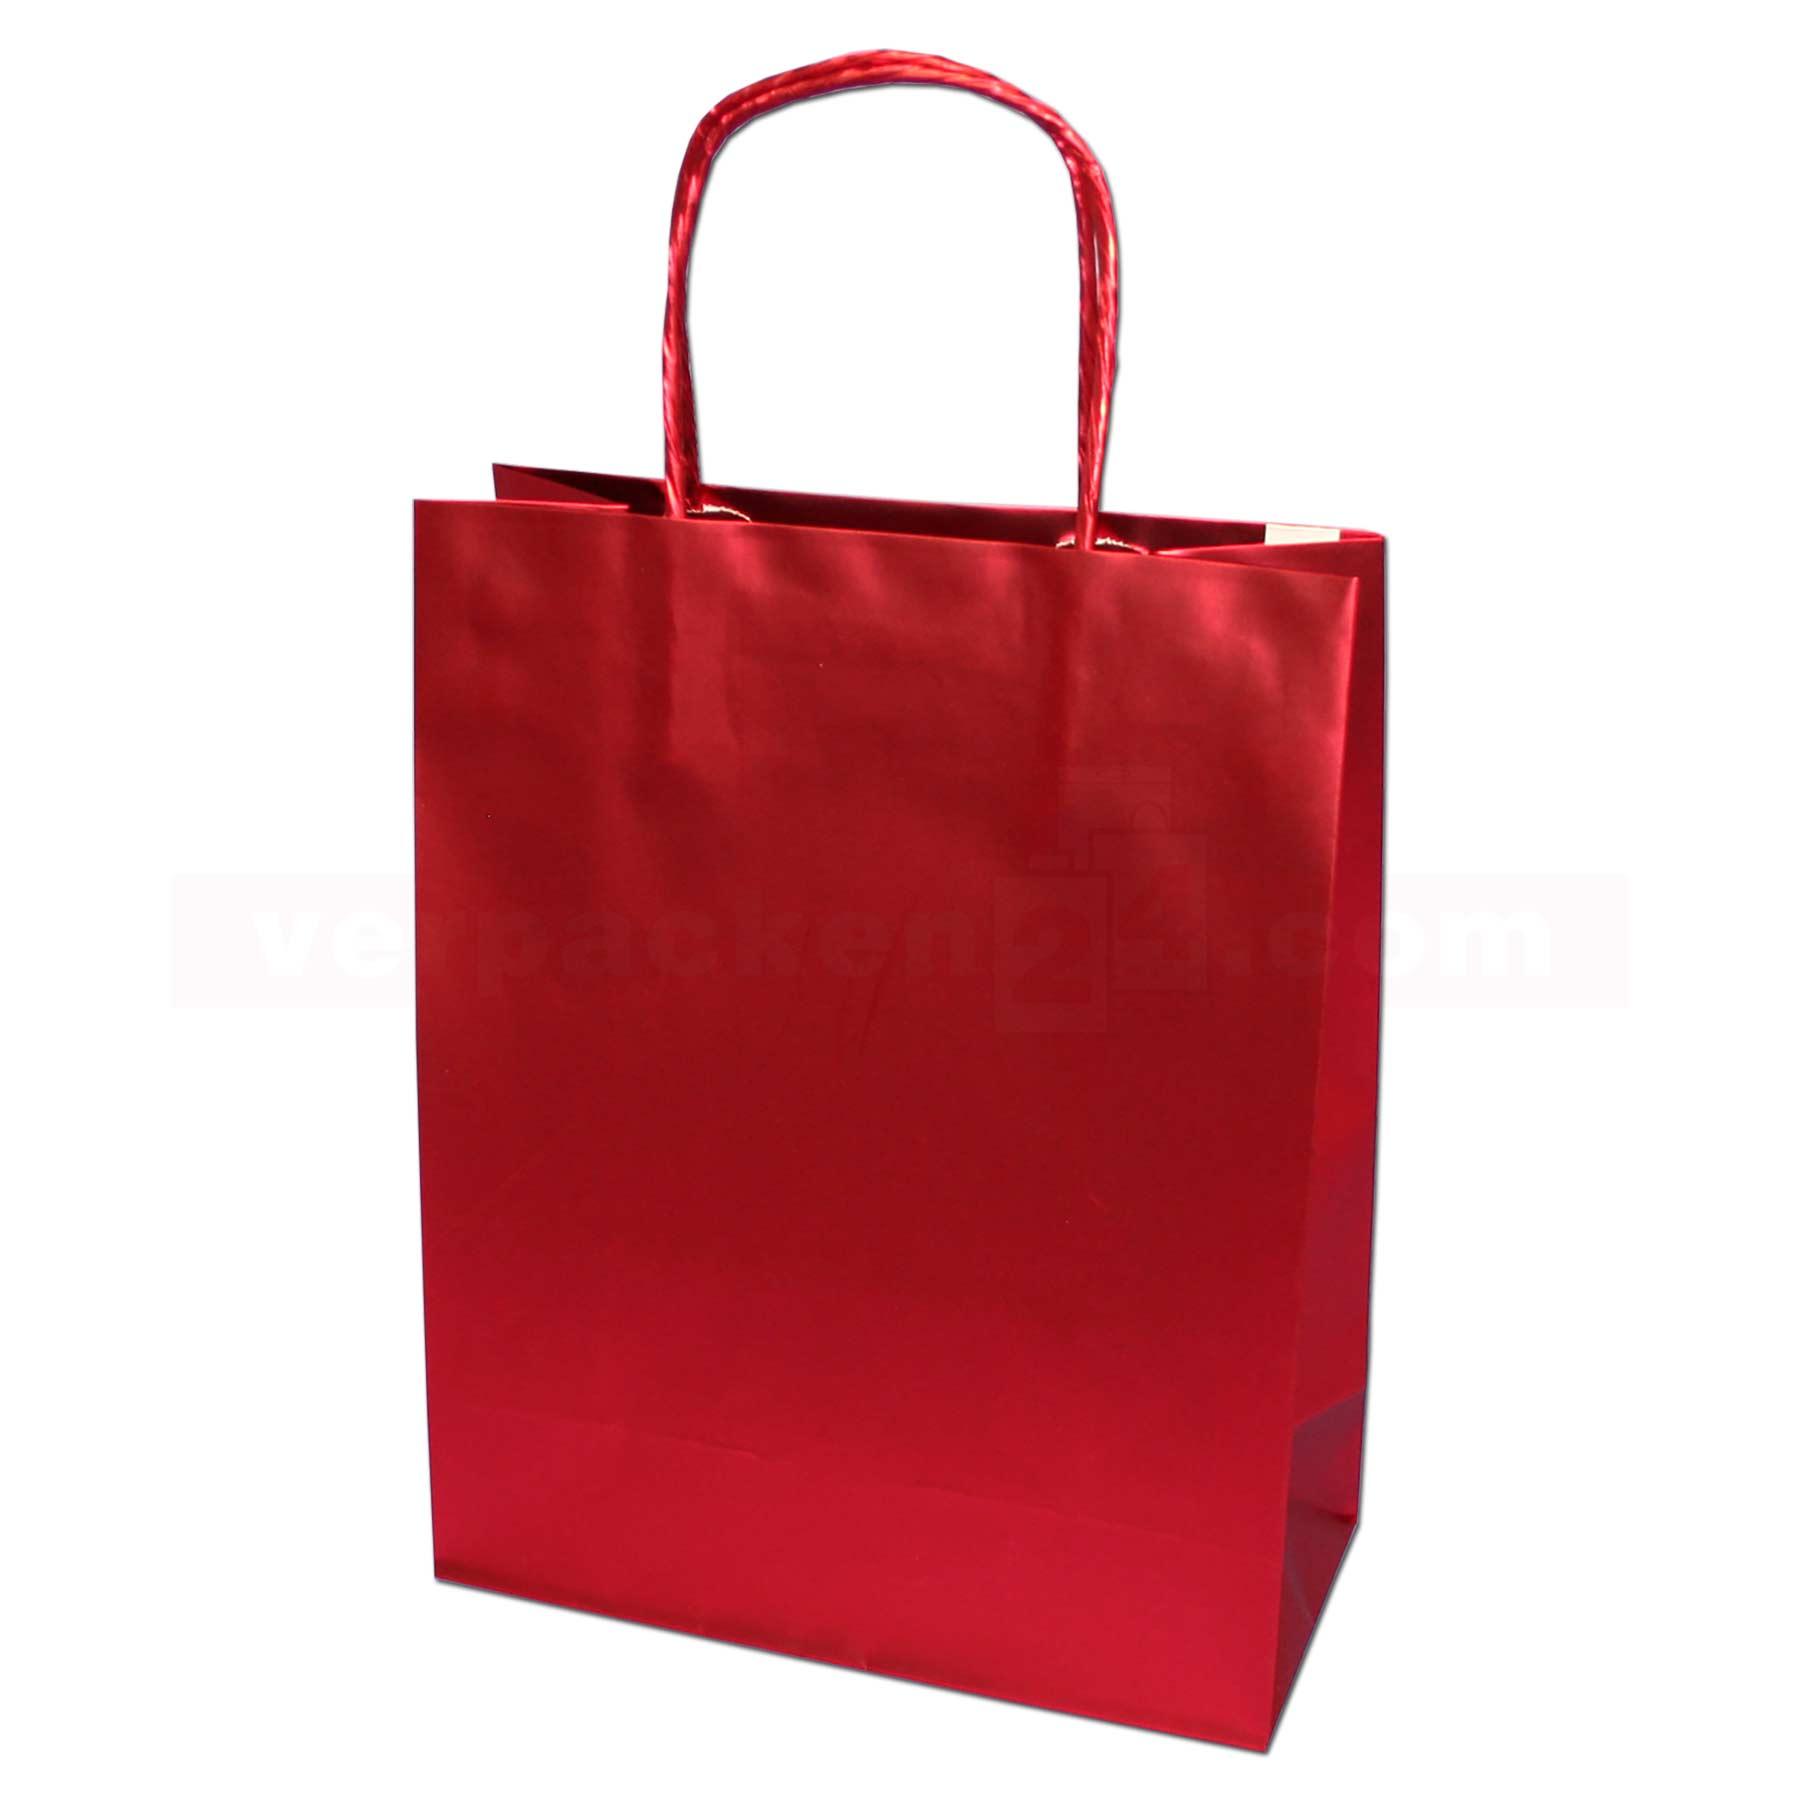 papiertragetasche mainz chrome rot 22 10x27cm online shop. Black Bedroom Furniture Sets. Home Design Ideas